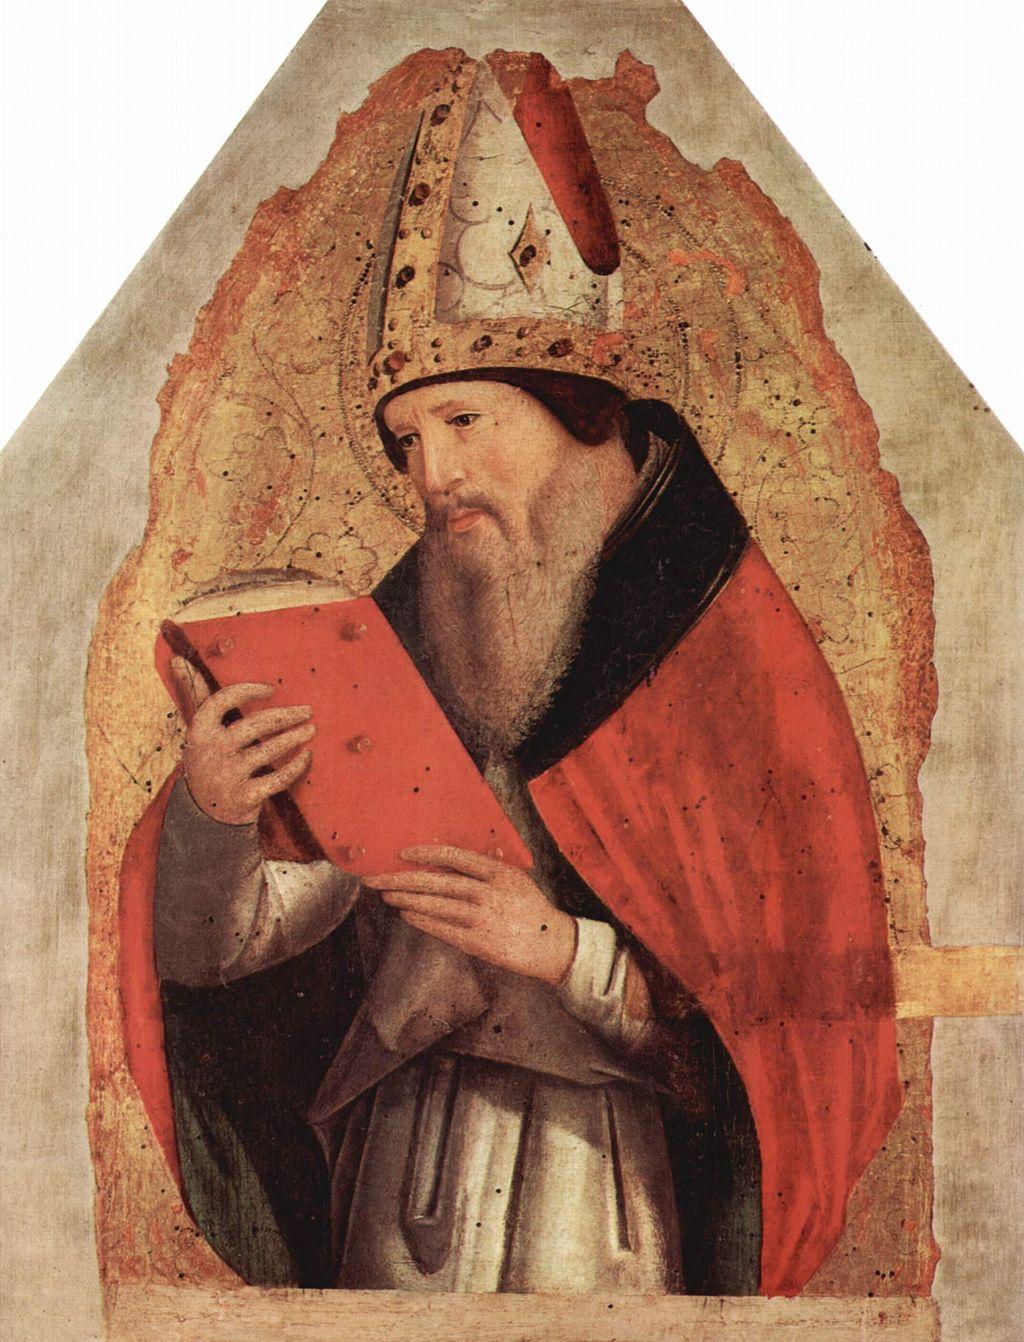 St. Augustinus,data circa 1472-1473, tempera on panel, 46.5 × 36 cm (18.3 × 14.2 in), Galleria Regionale della Sicilia, Palermo